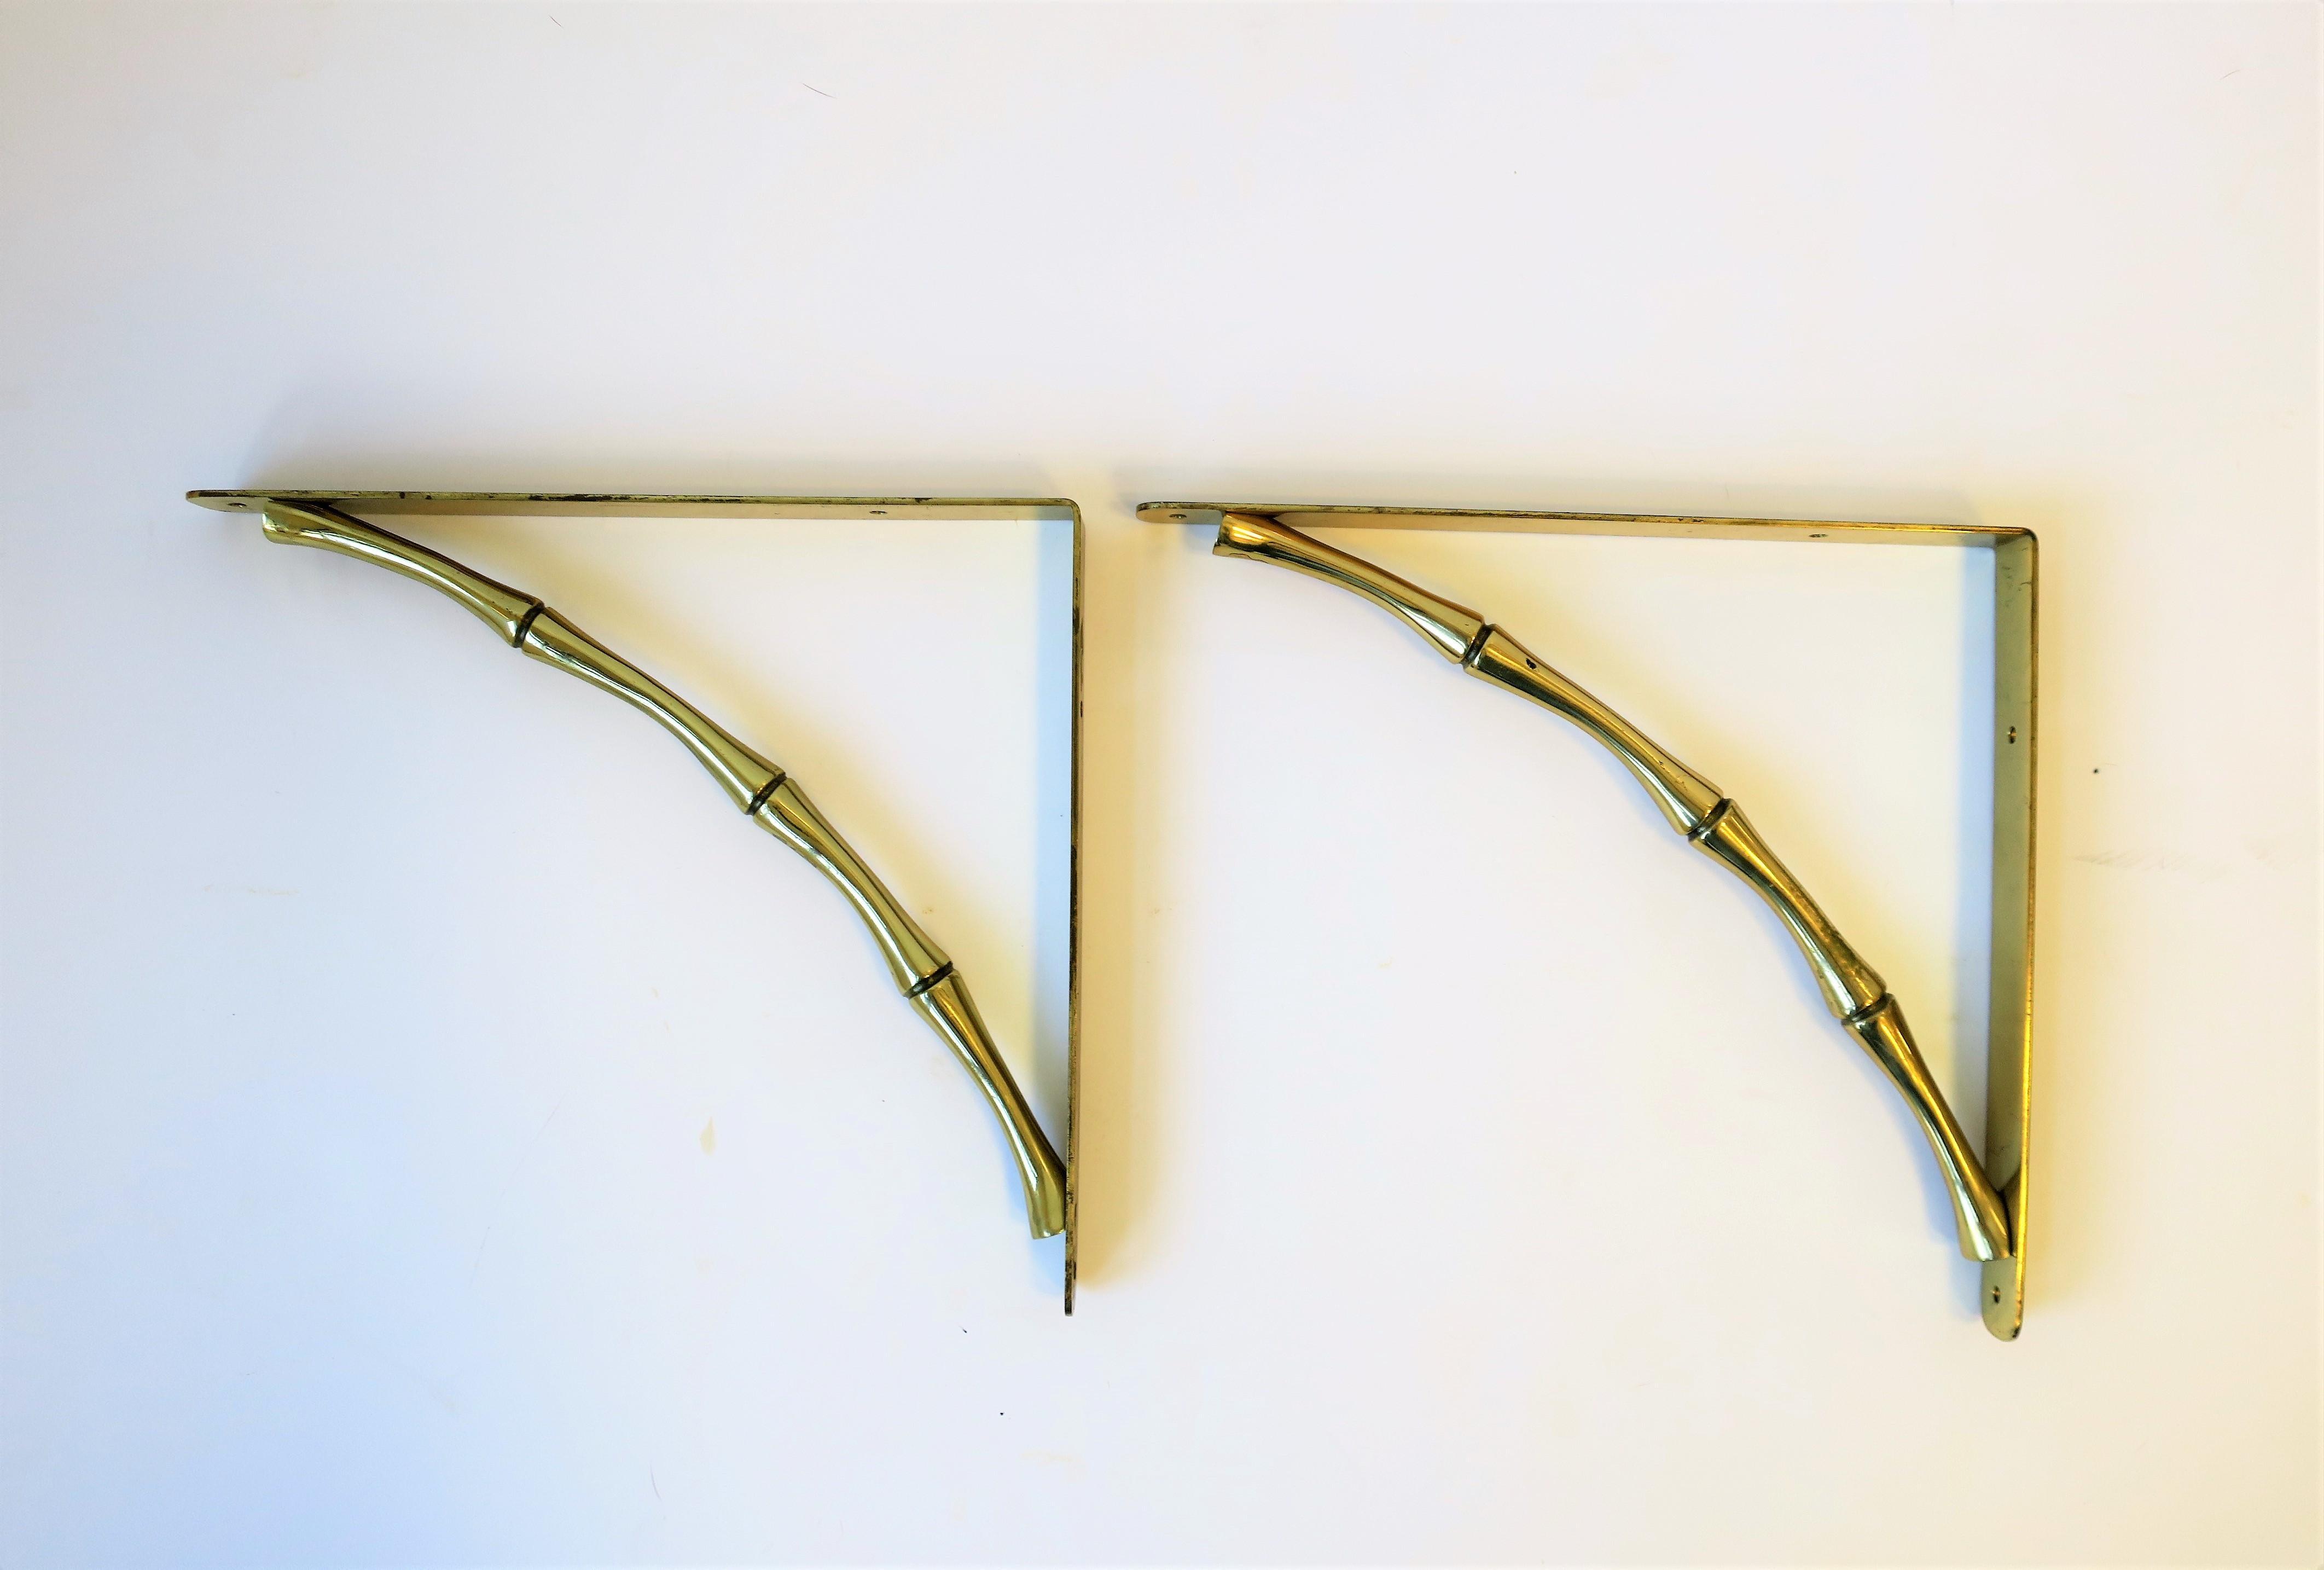 Brass Bamboo Hardware Wall Shelf Brackets At 1stdibs